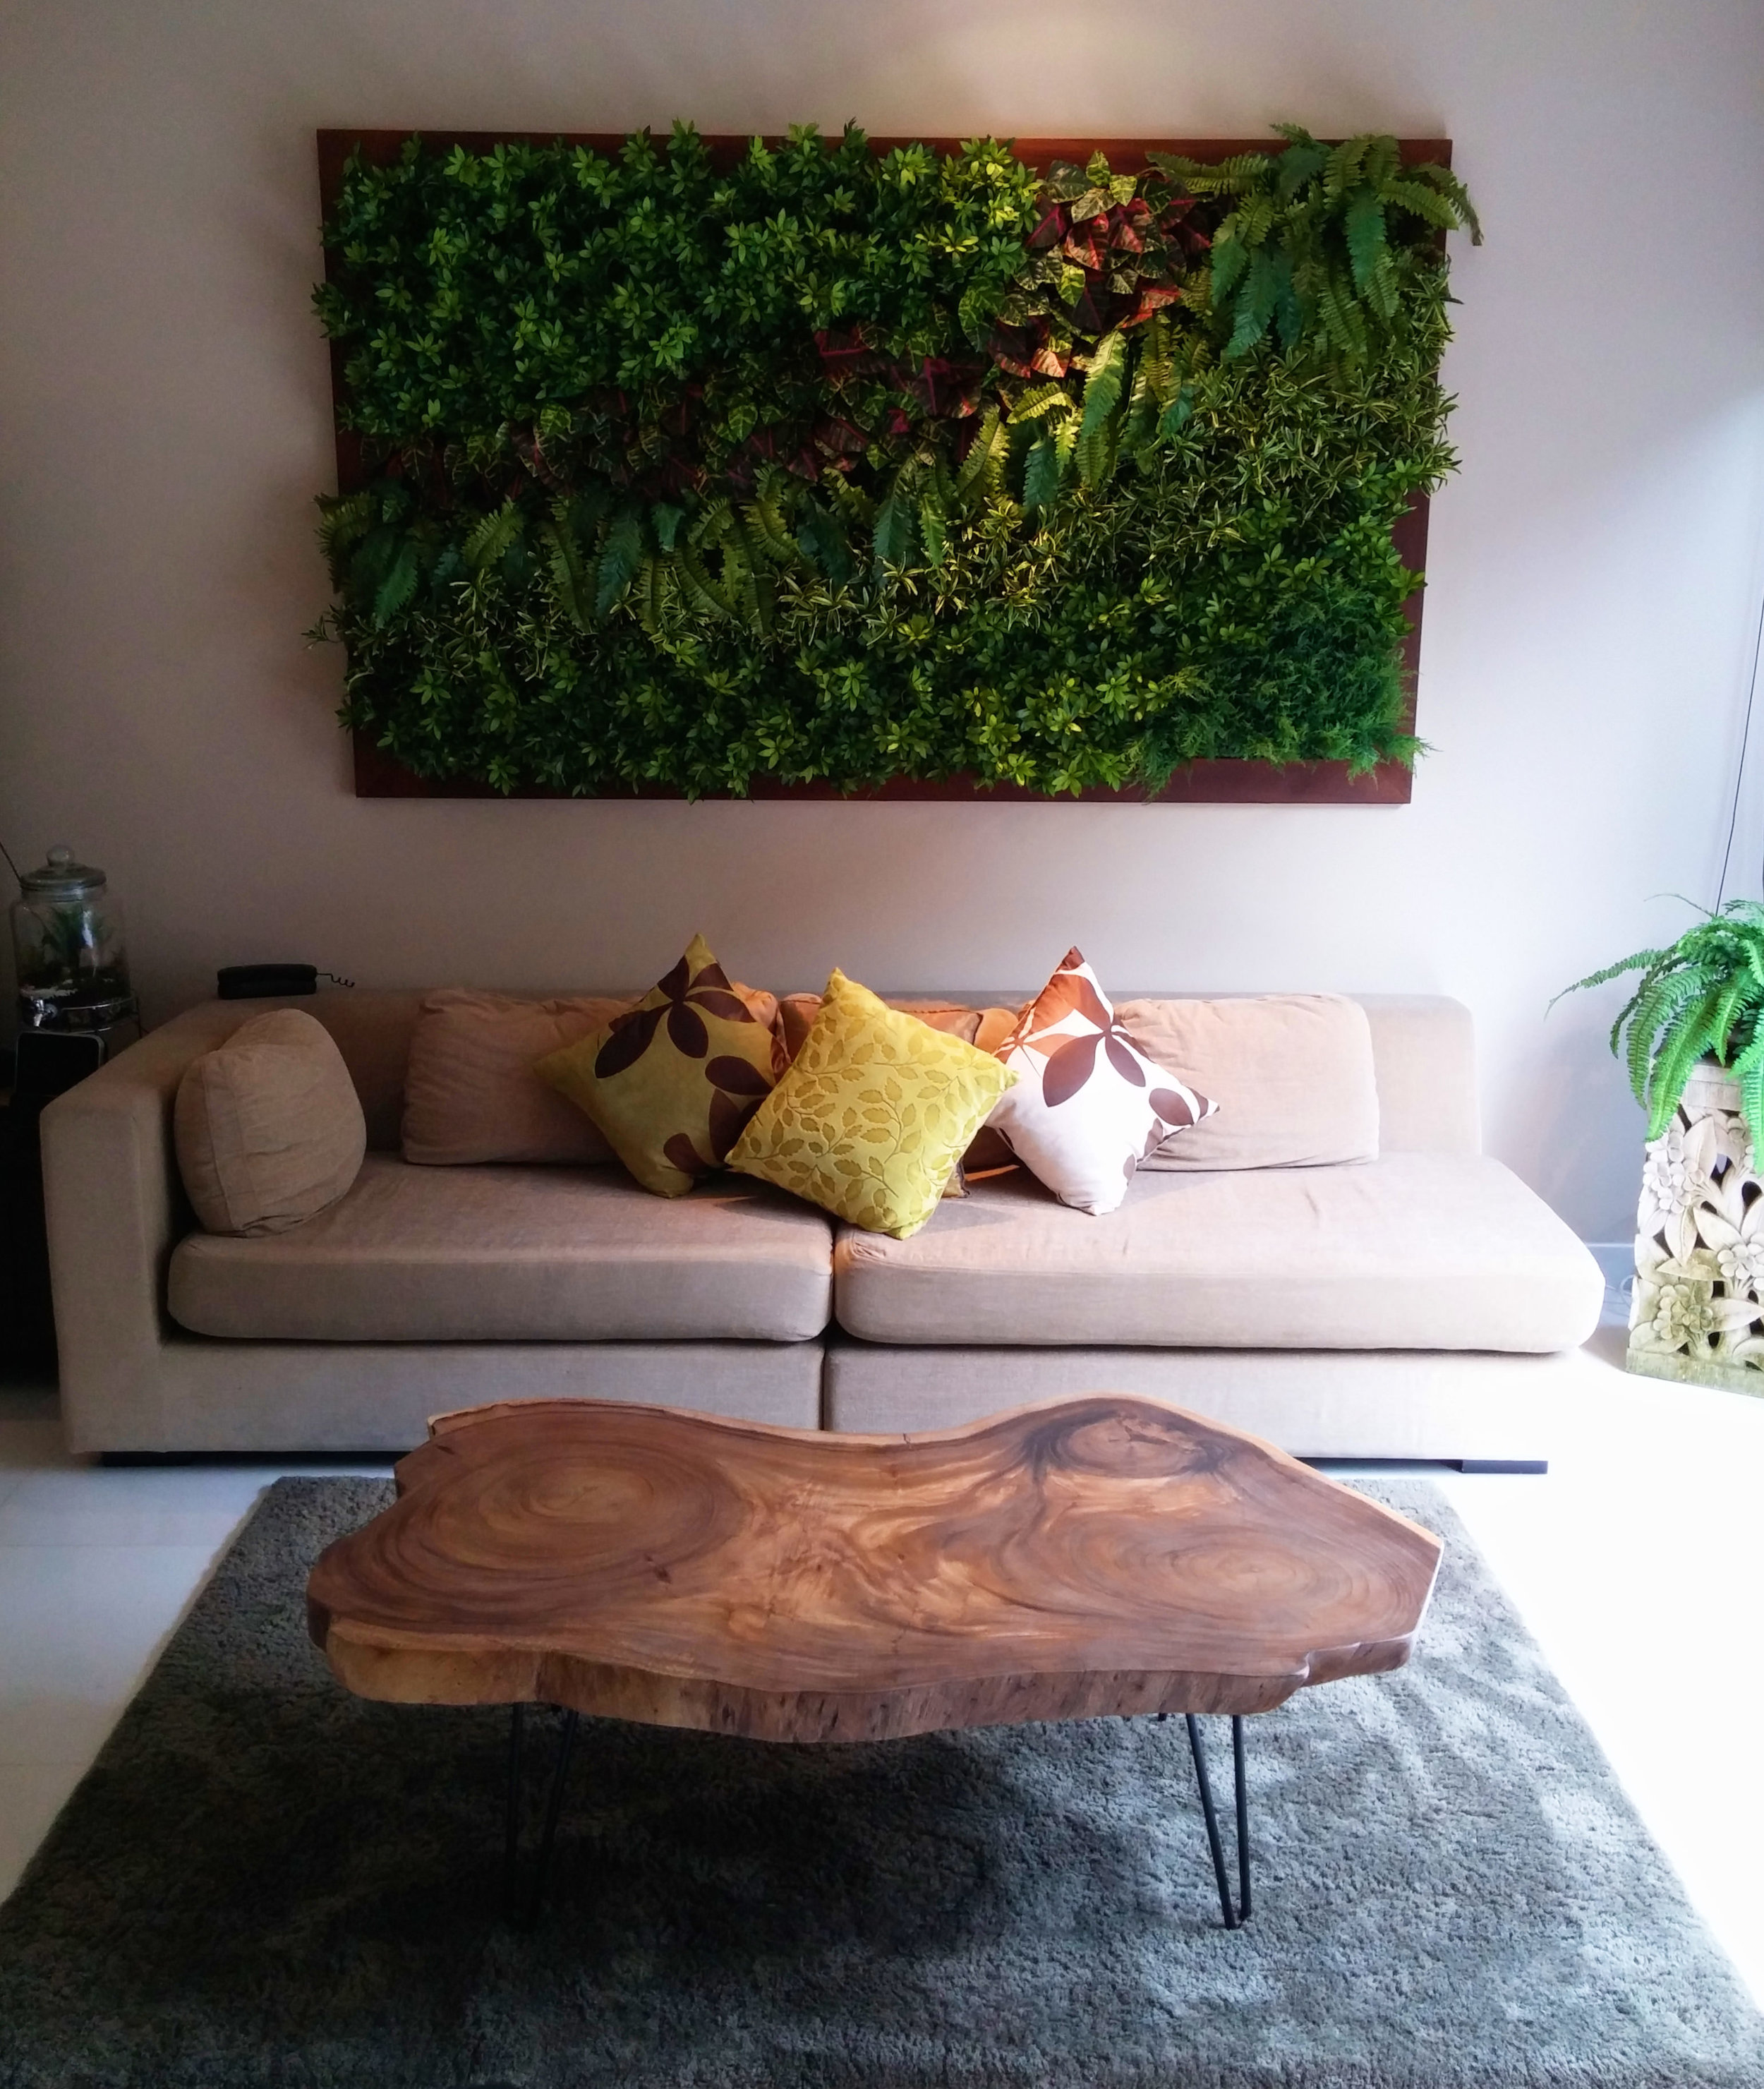 Suar Wood Coffee Table // Herman Furniture Singapore.jpg